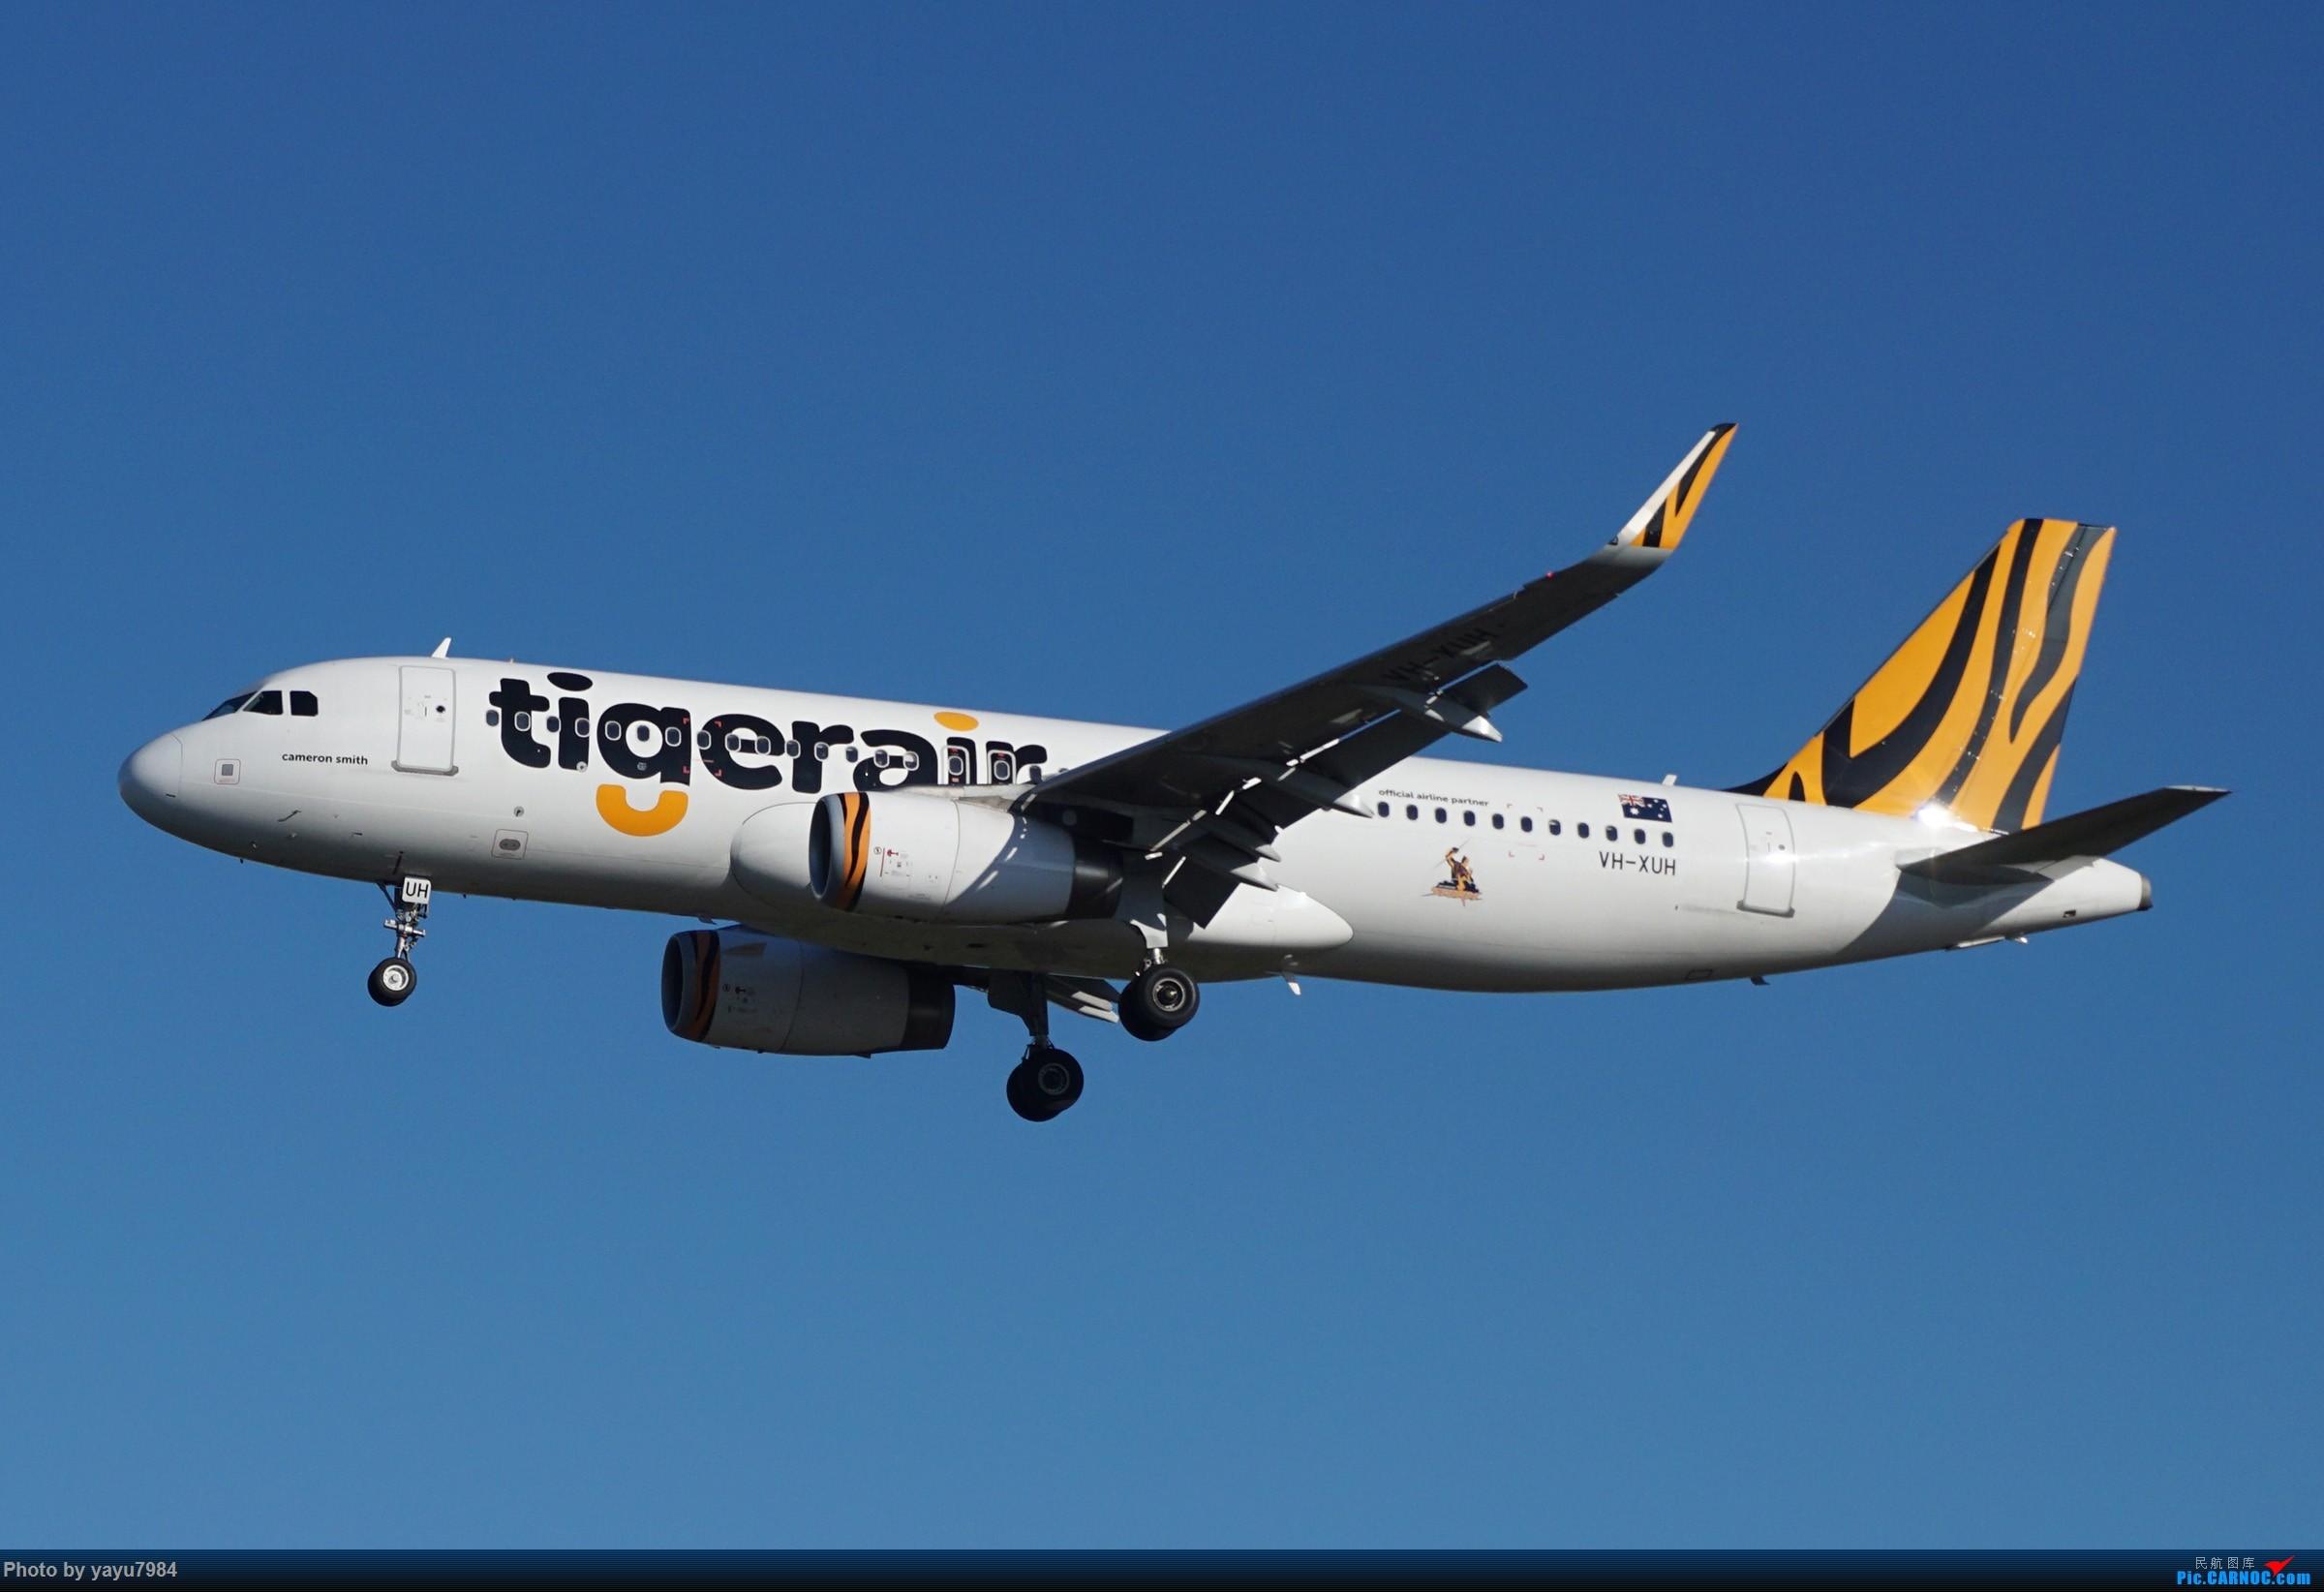 Re:[原创][SYD] 晨悉尼,16R扎堆到达 AIRBUS A320-200 VH-XUH 澳大利亚悉尼金斯福德·史密斯机场